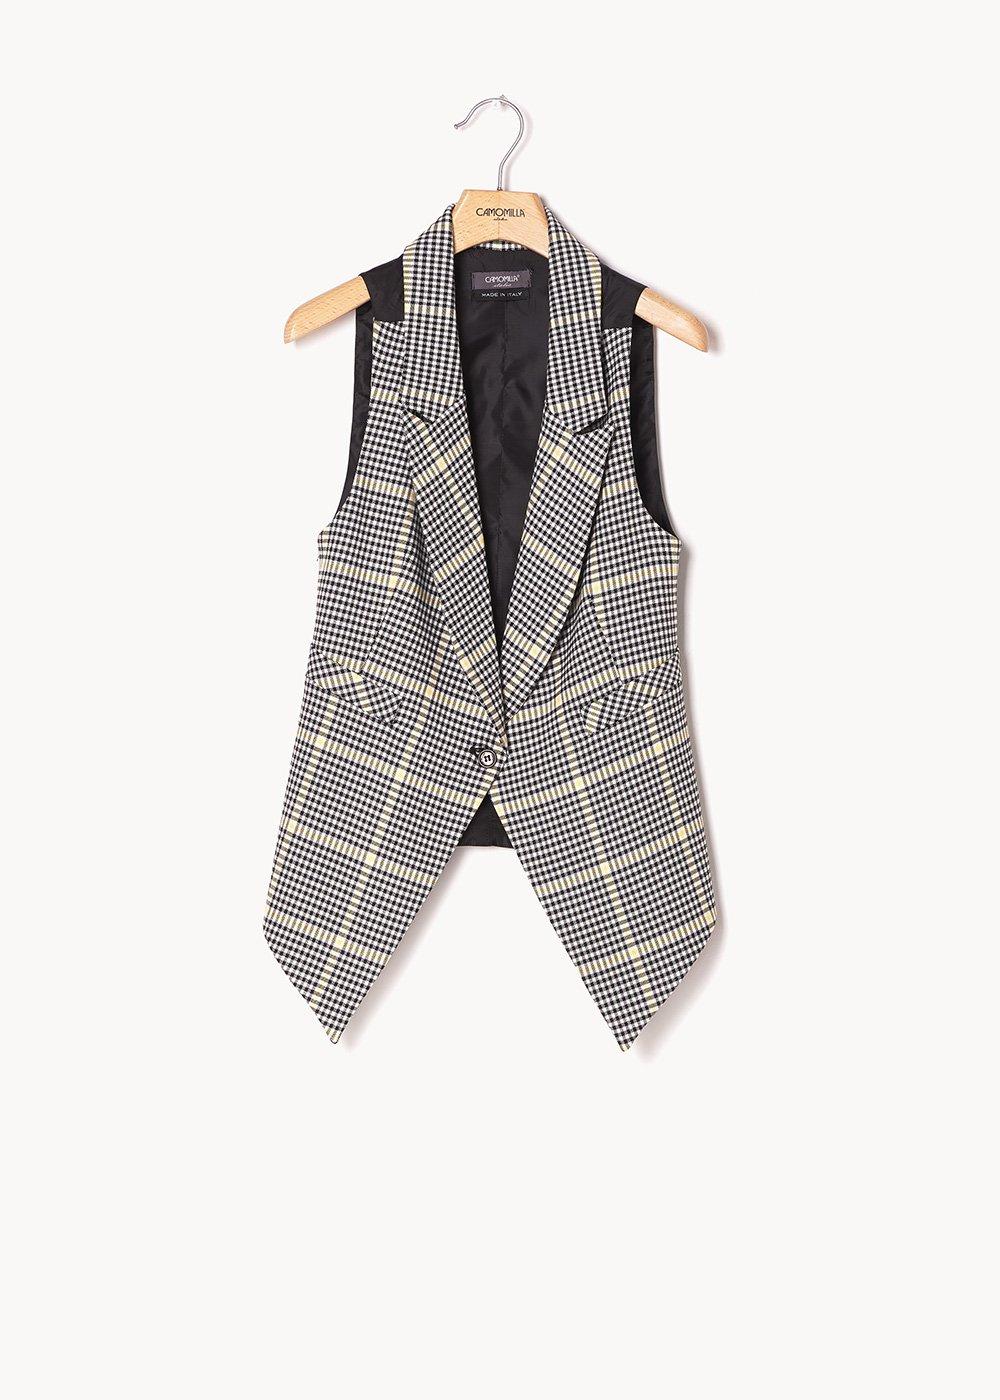 Gil waistcoat with checked pattern - White Black Fantasia - Woman